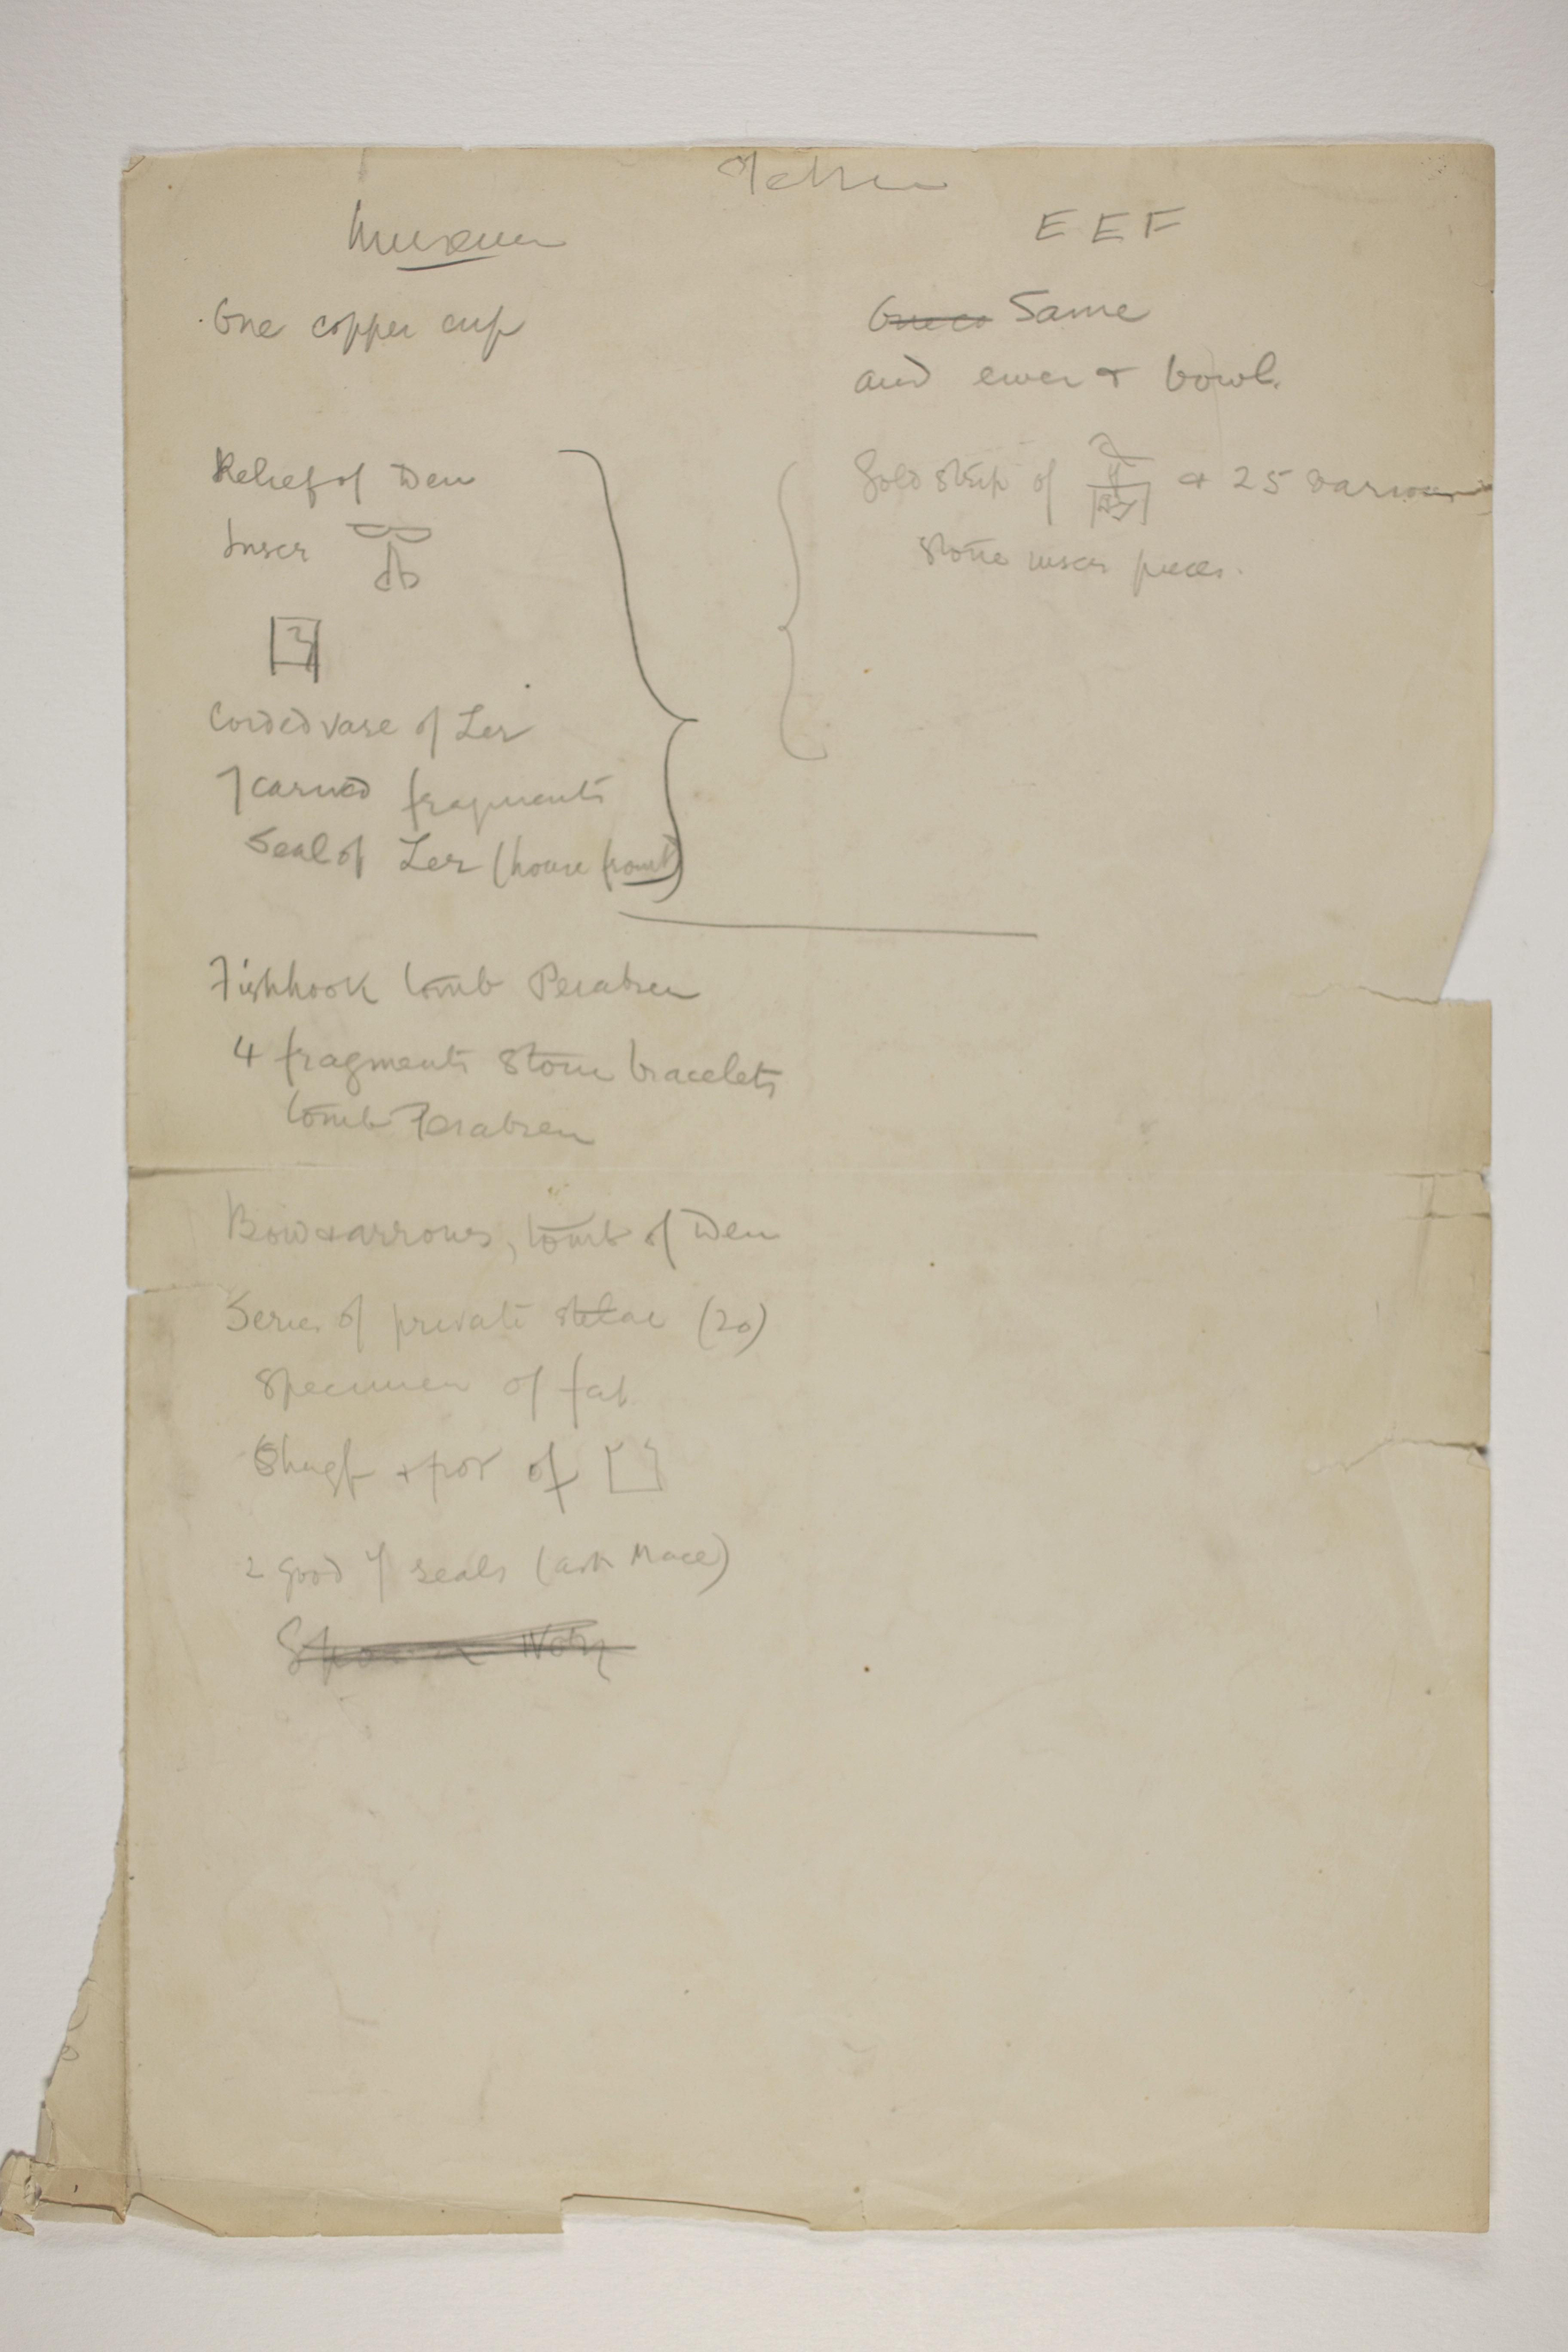 Abydos, Bet Khallaf, el-Mahasna 1900-1901, Distribution List, PMA/WFP1/D/9/3